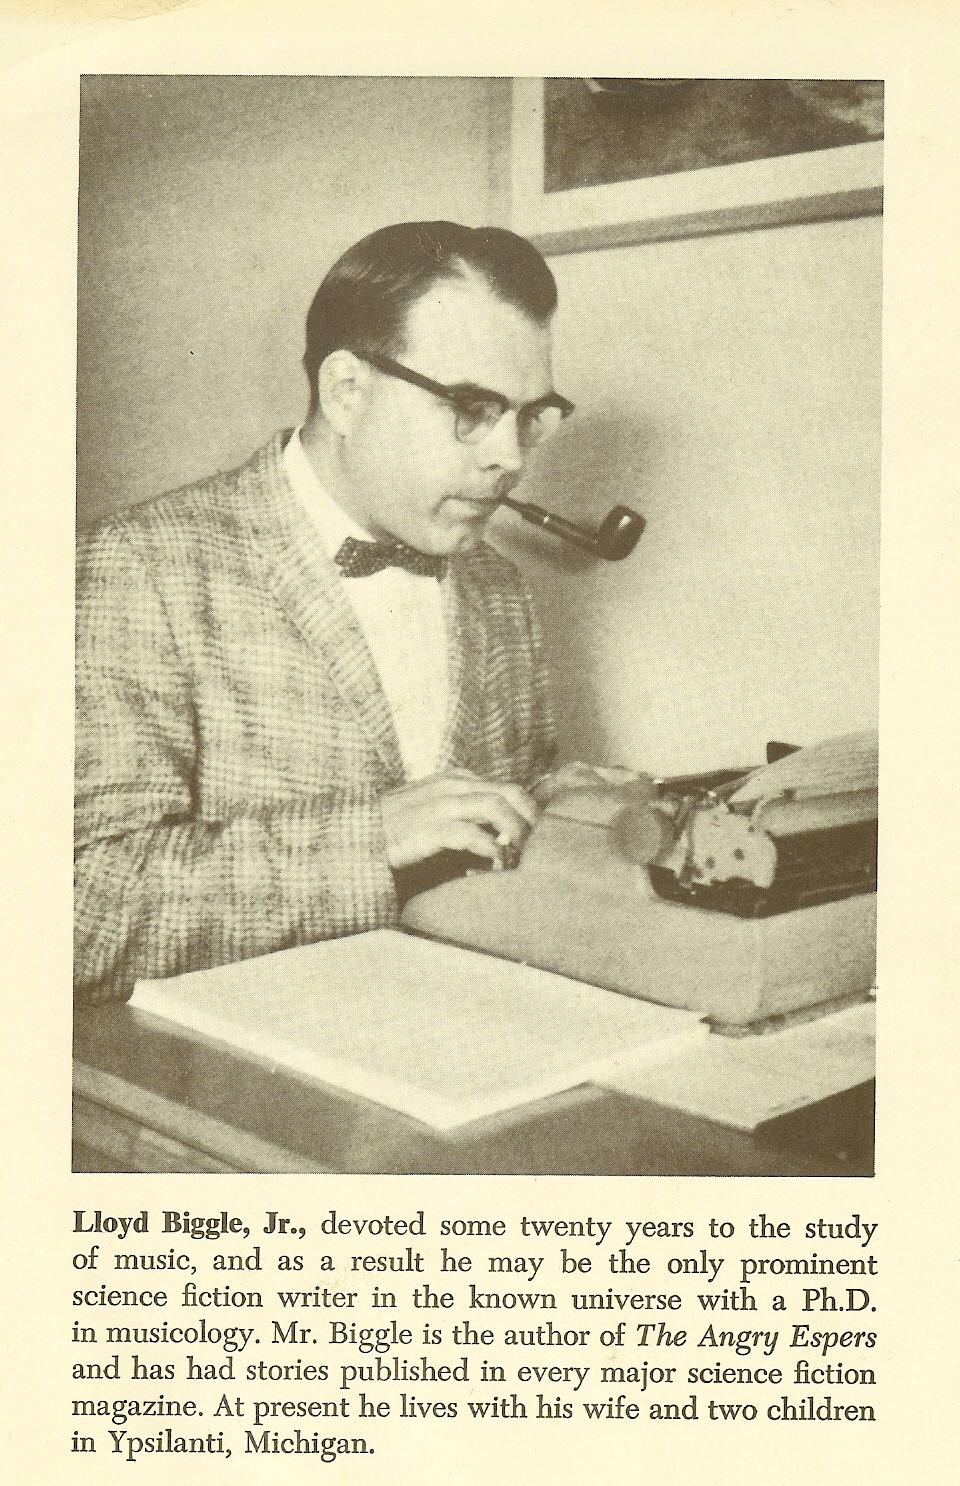 Lloyd Jr Biggle